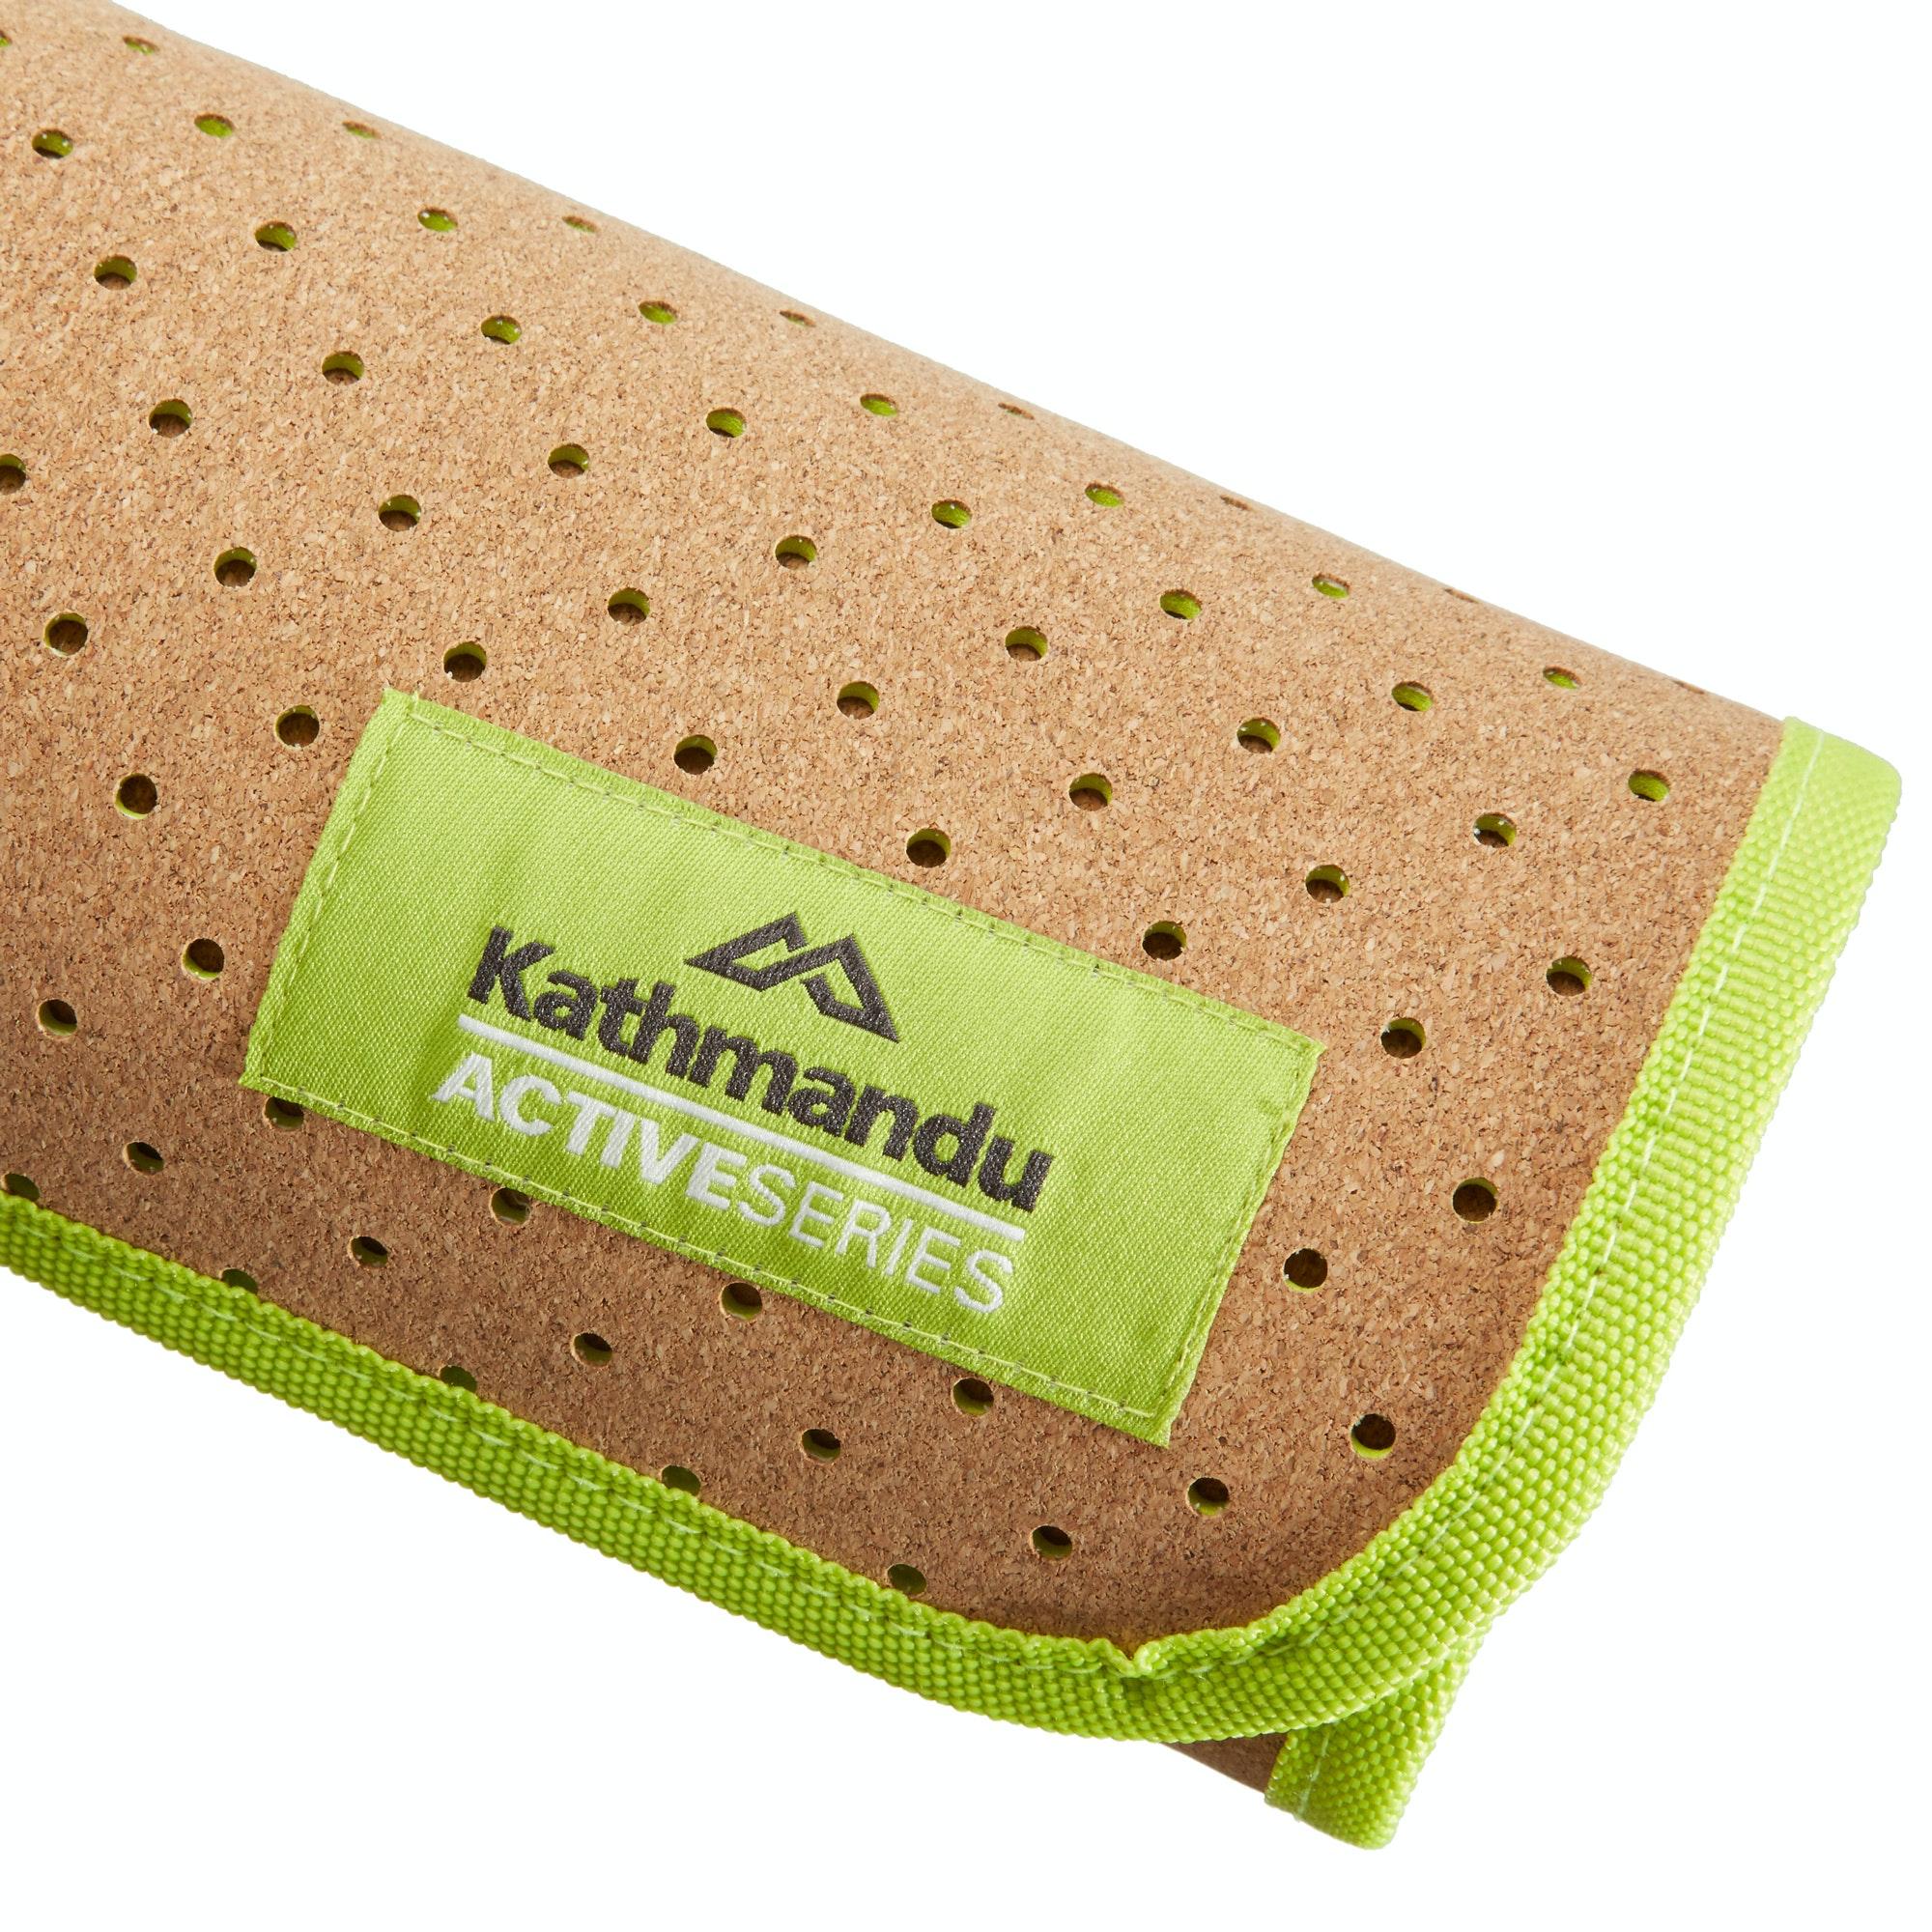 eyes roll chuchka cork yoga mats mat products